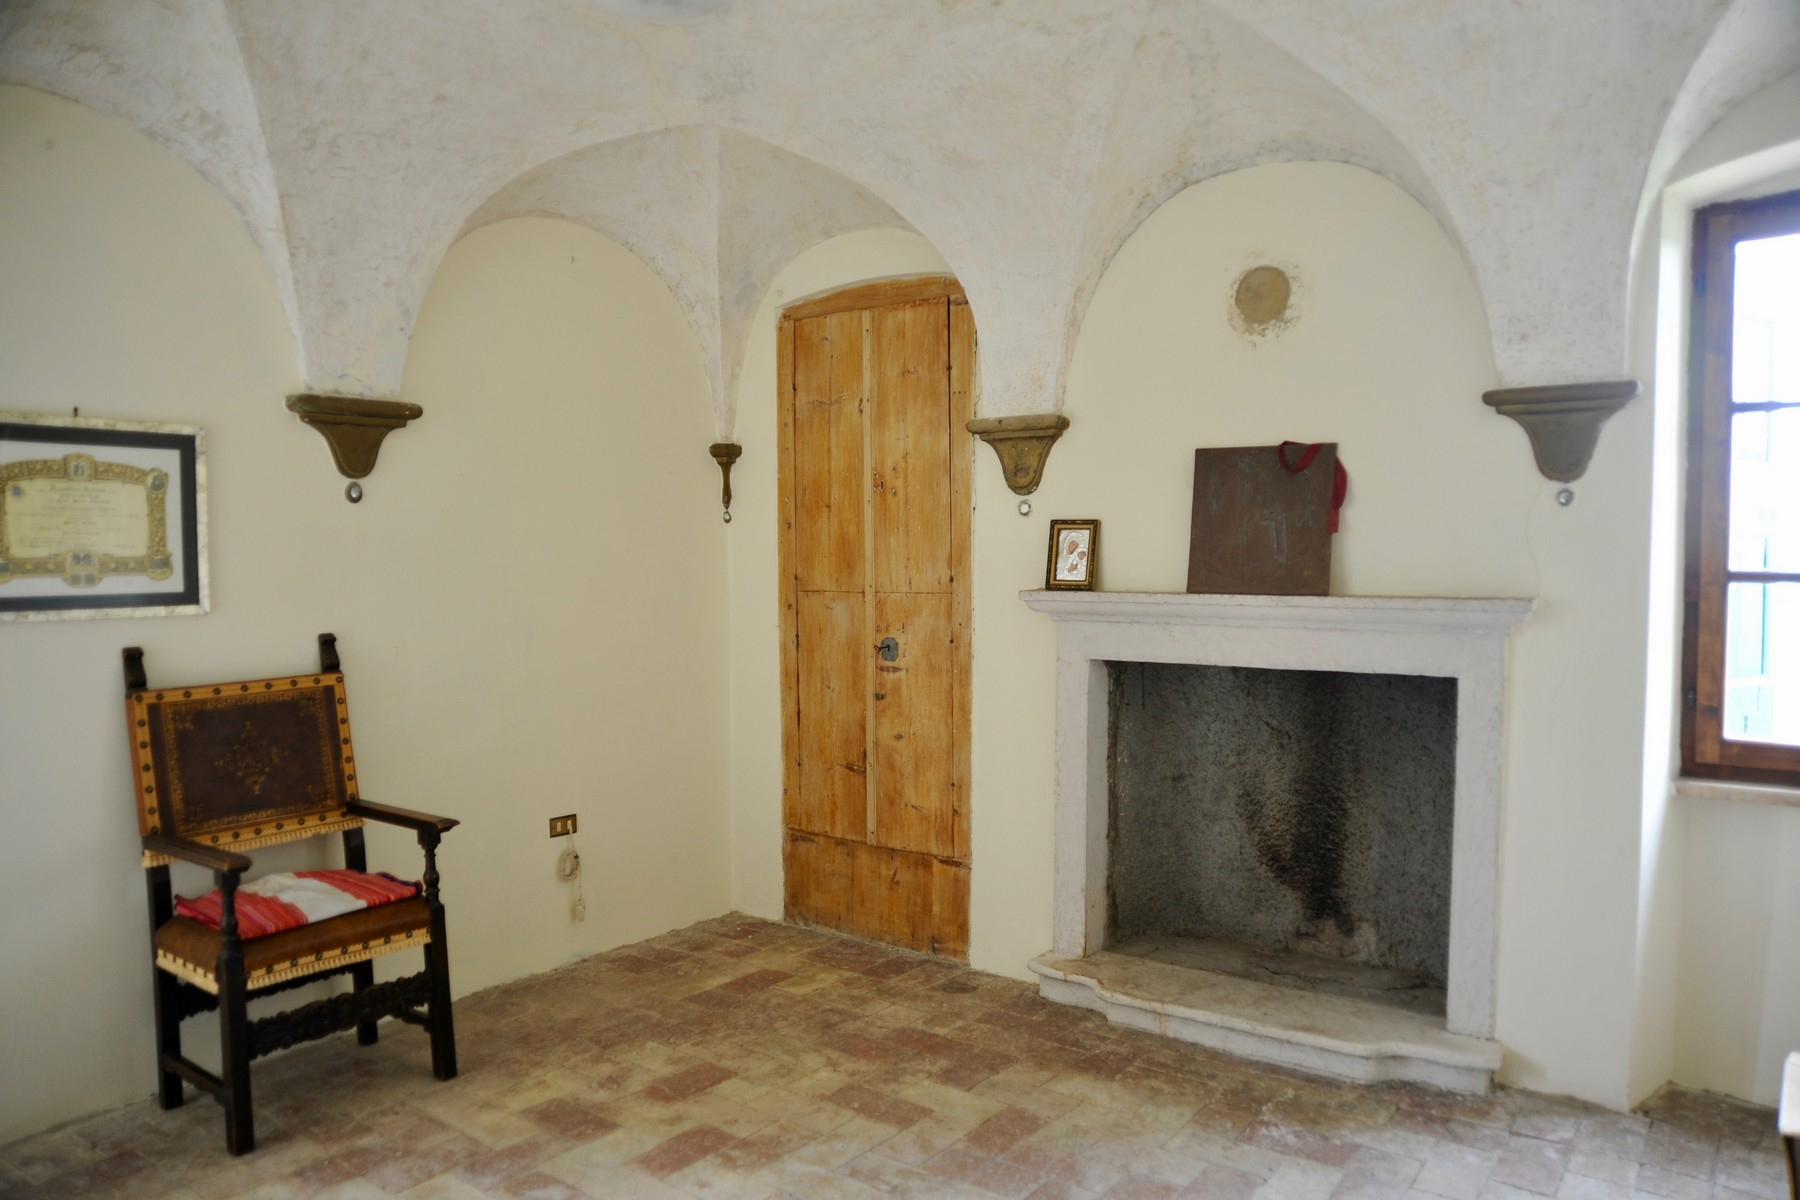 Villa in Vendita a Verona: 5 locali, 450 mq - Foto 9